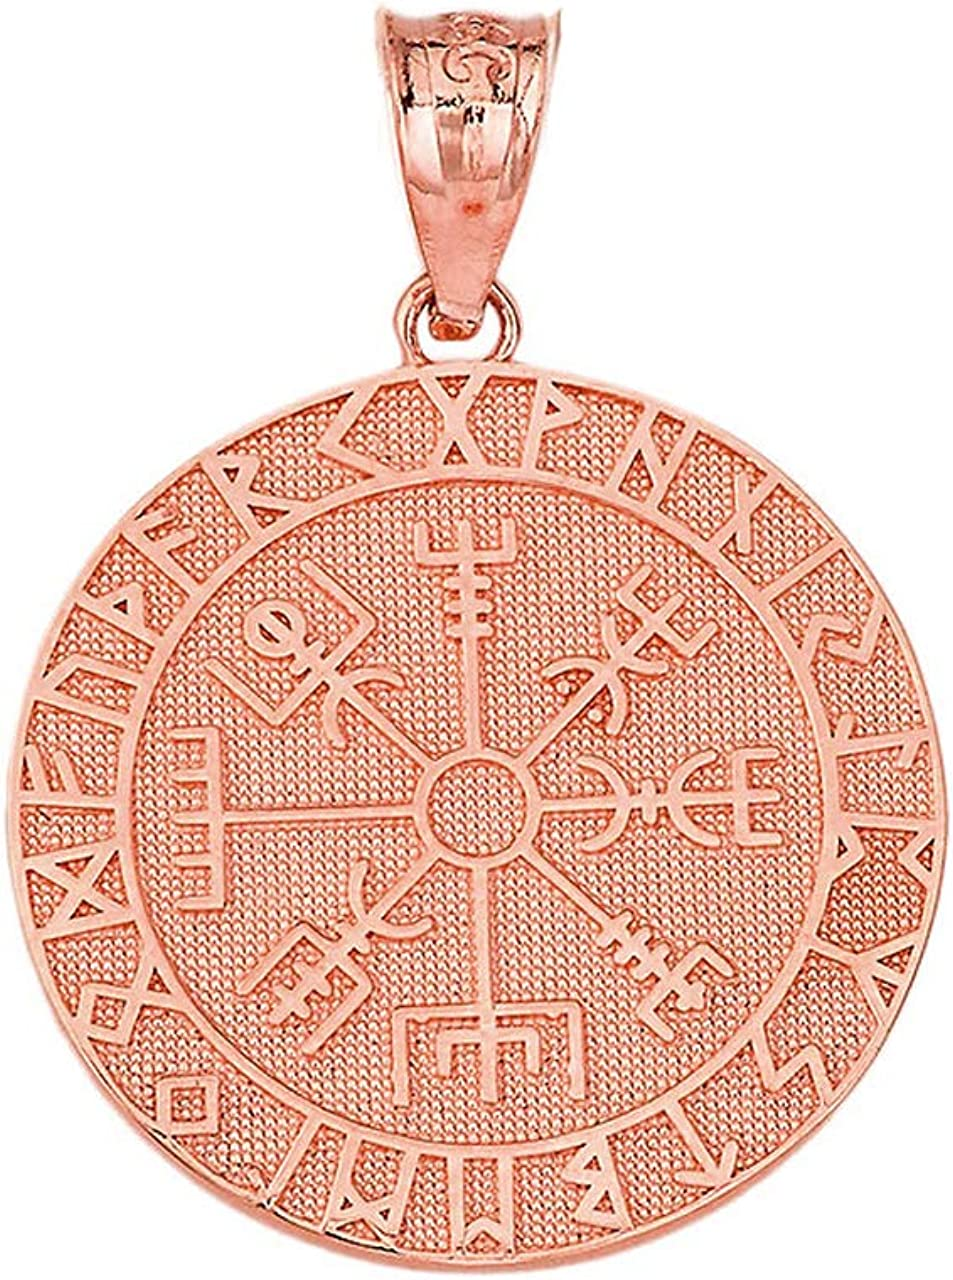 Arthwick Store Viking Symbol Vegvisir Runic Compass Pendant Necklace